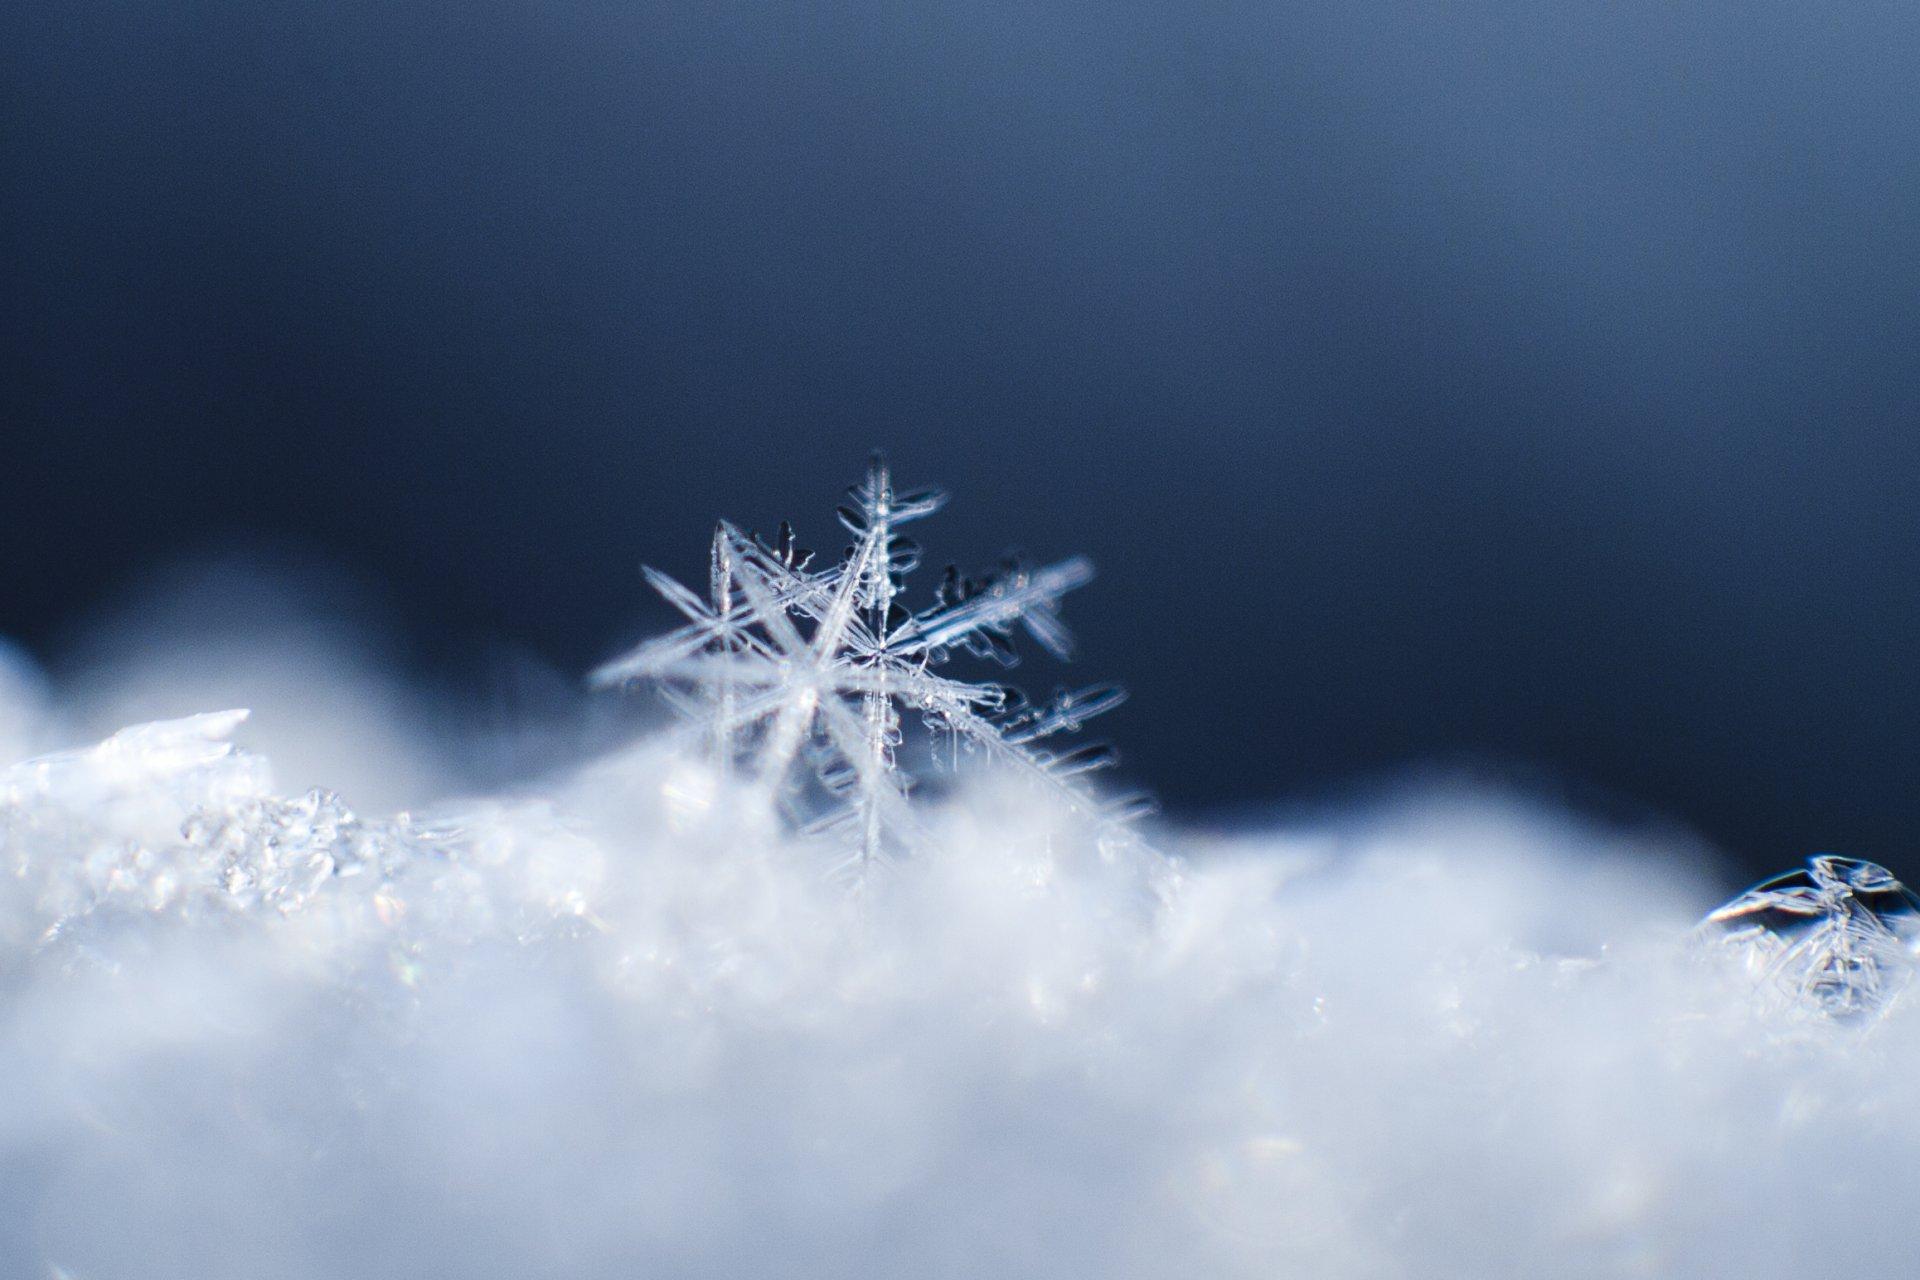 воспоминаниям картинки снег снежинки снегопад цветовая гамма